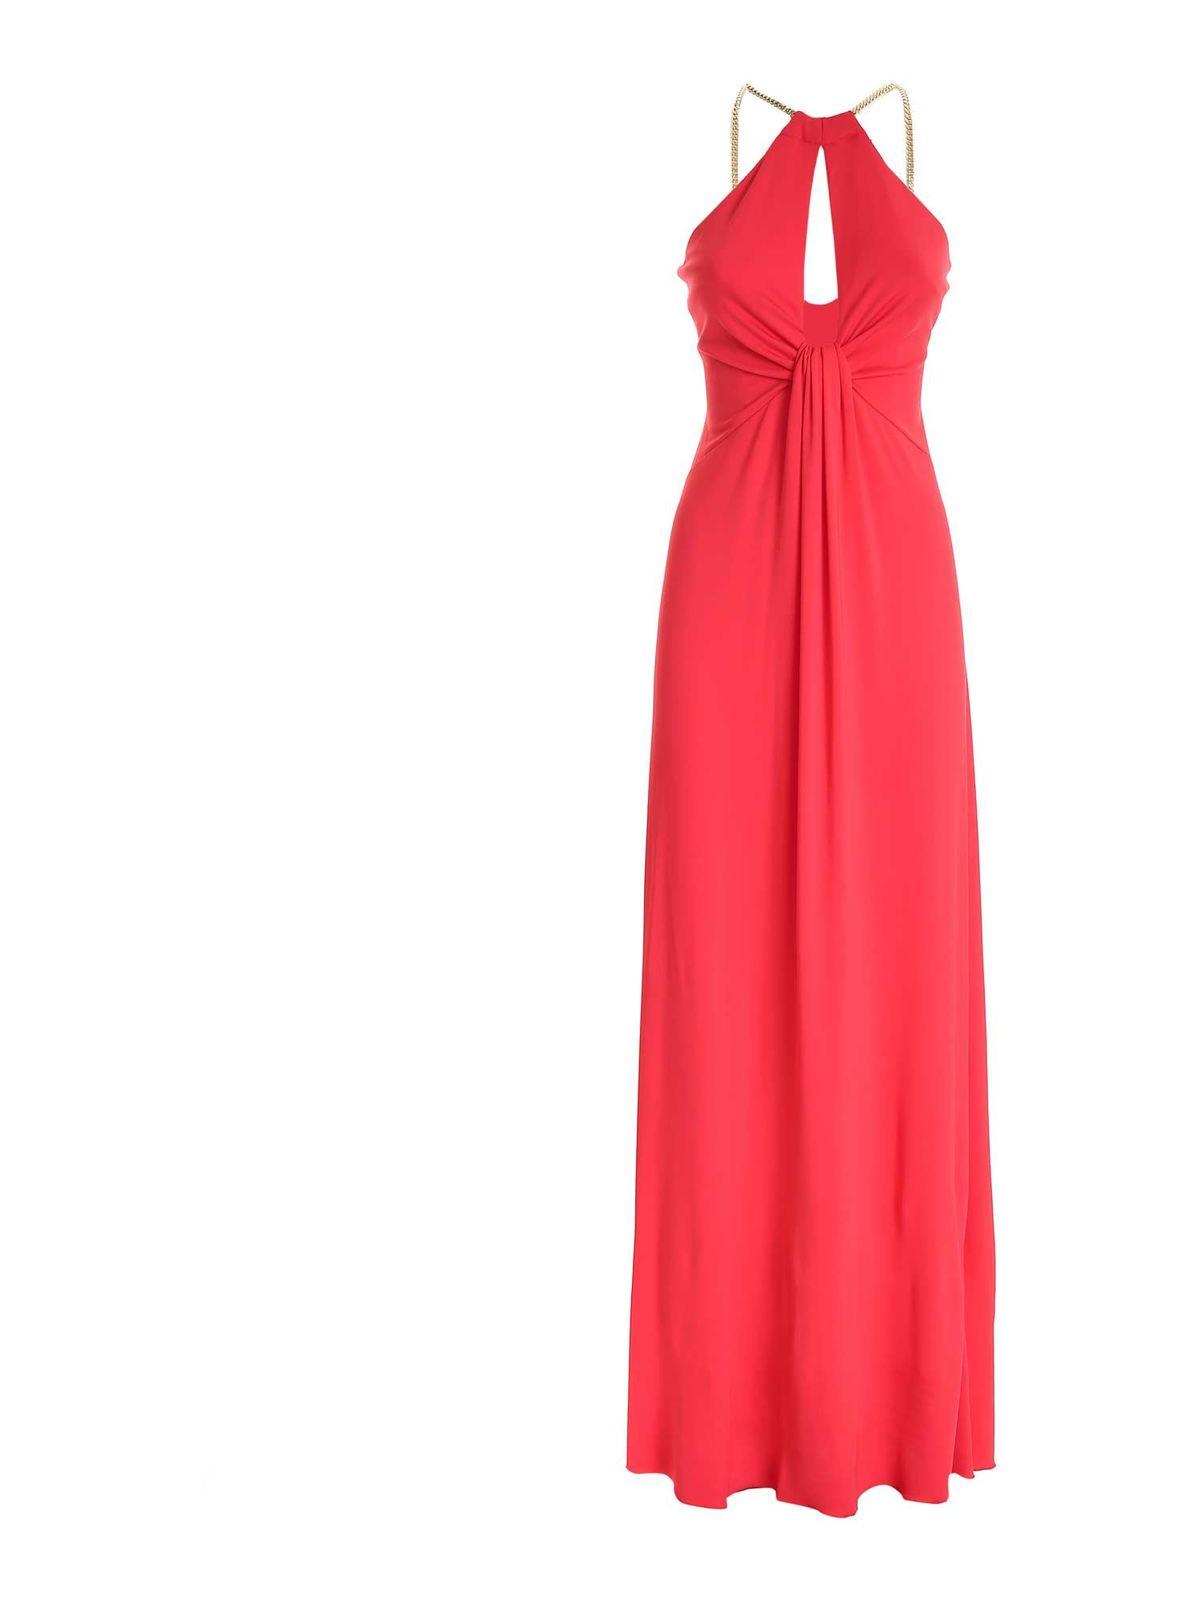 Blumarine CHAIN DETAIL DRESS IN CORAL RED